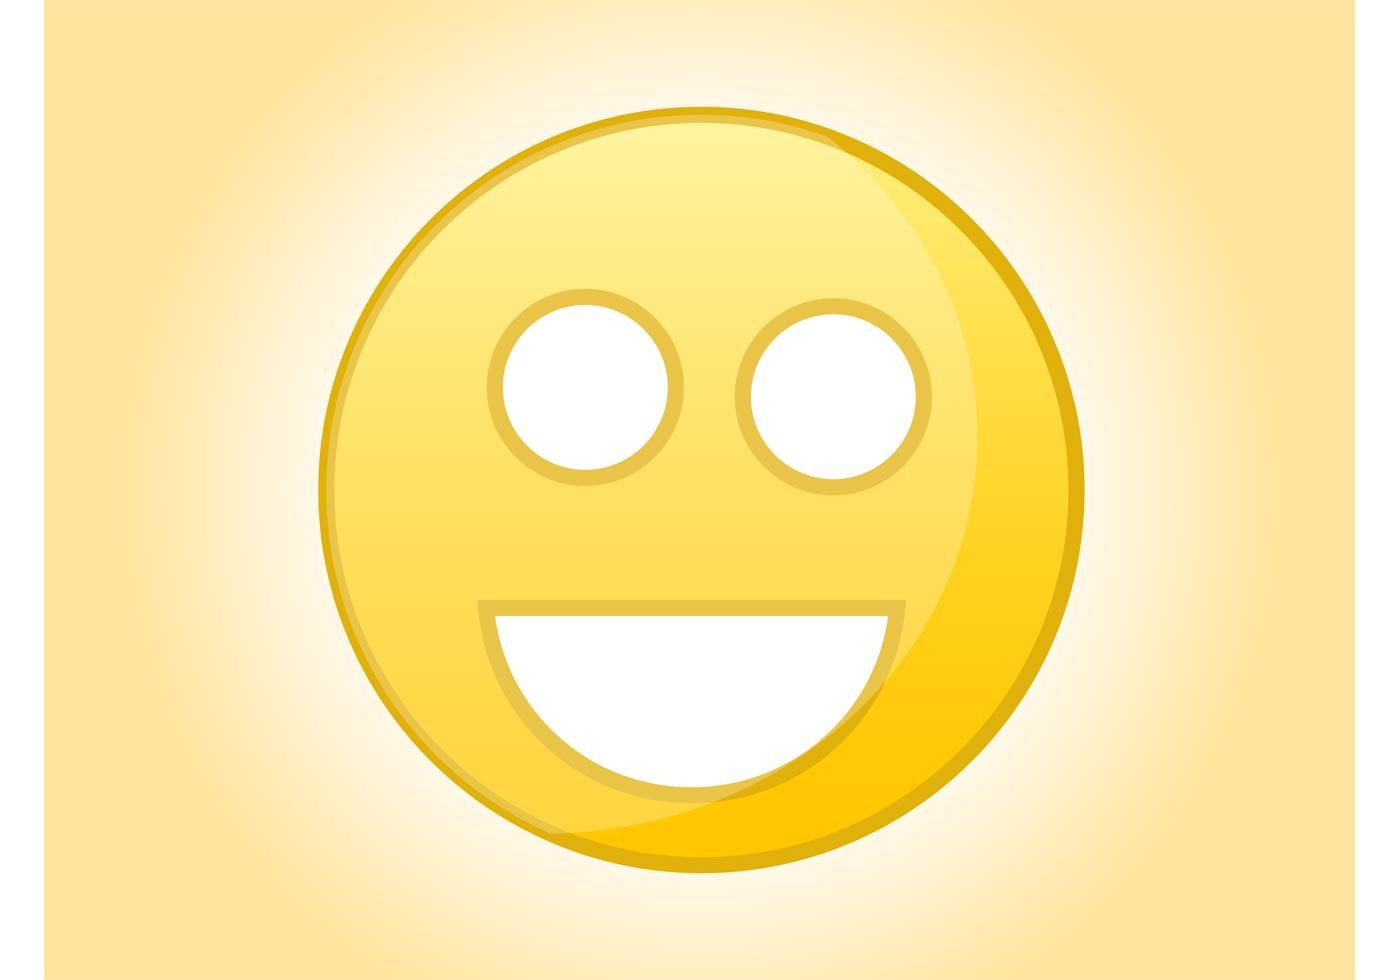 smiley face vector download free vector art  stock vector smiley face emoji with tongue out Smiley-Face Icon Vector